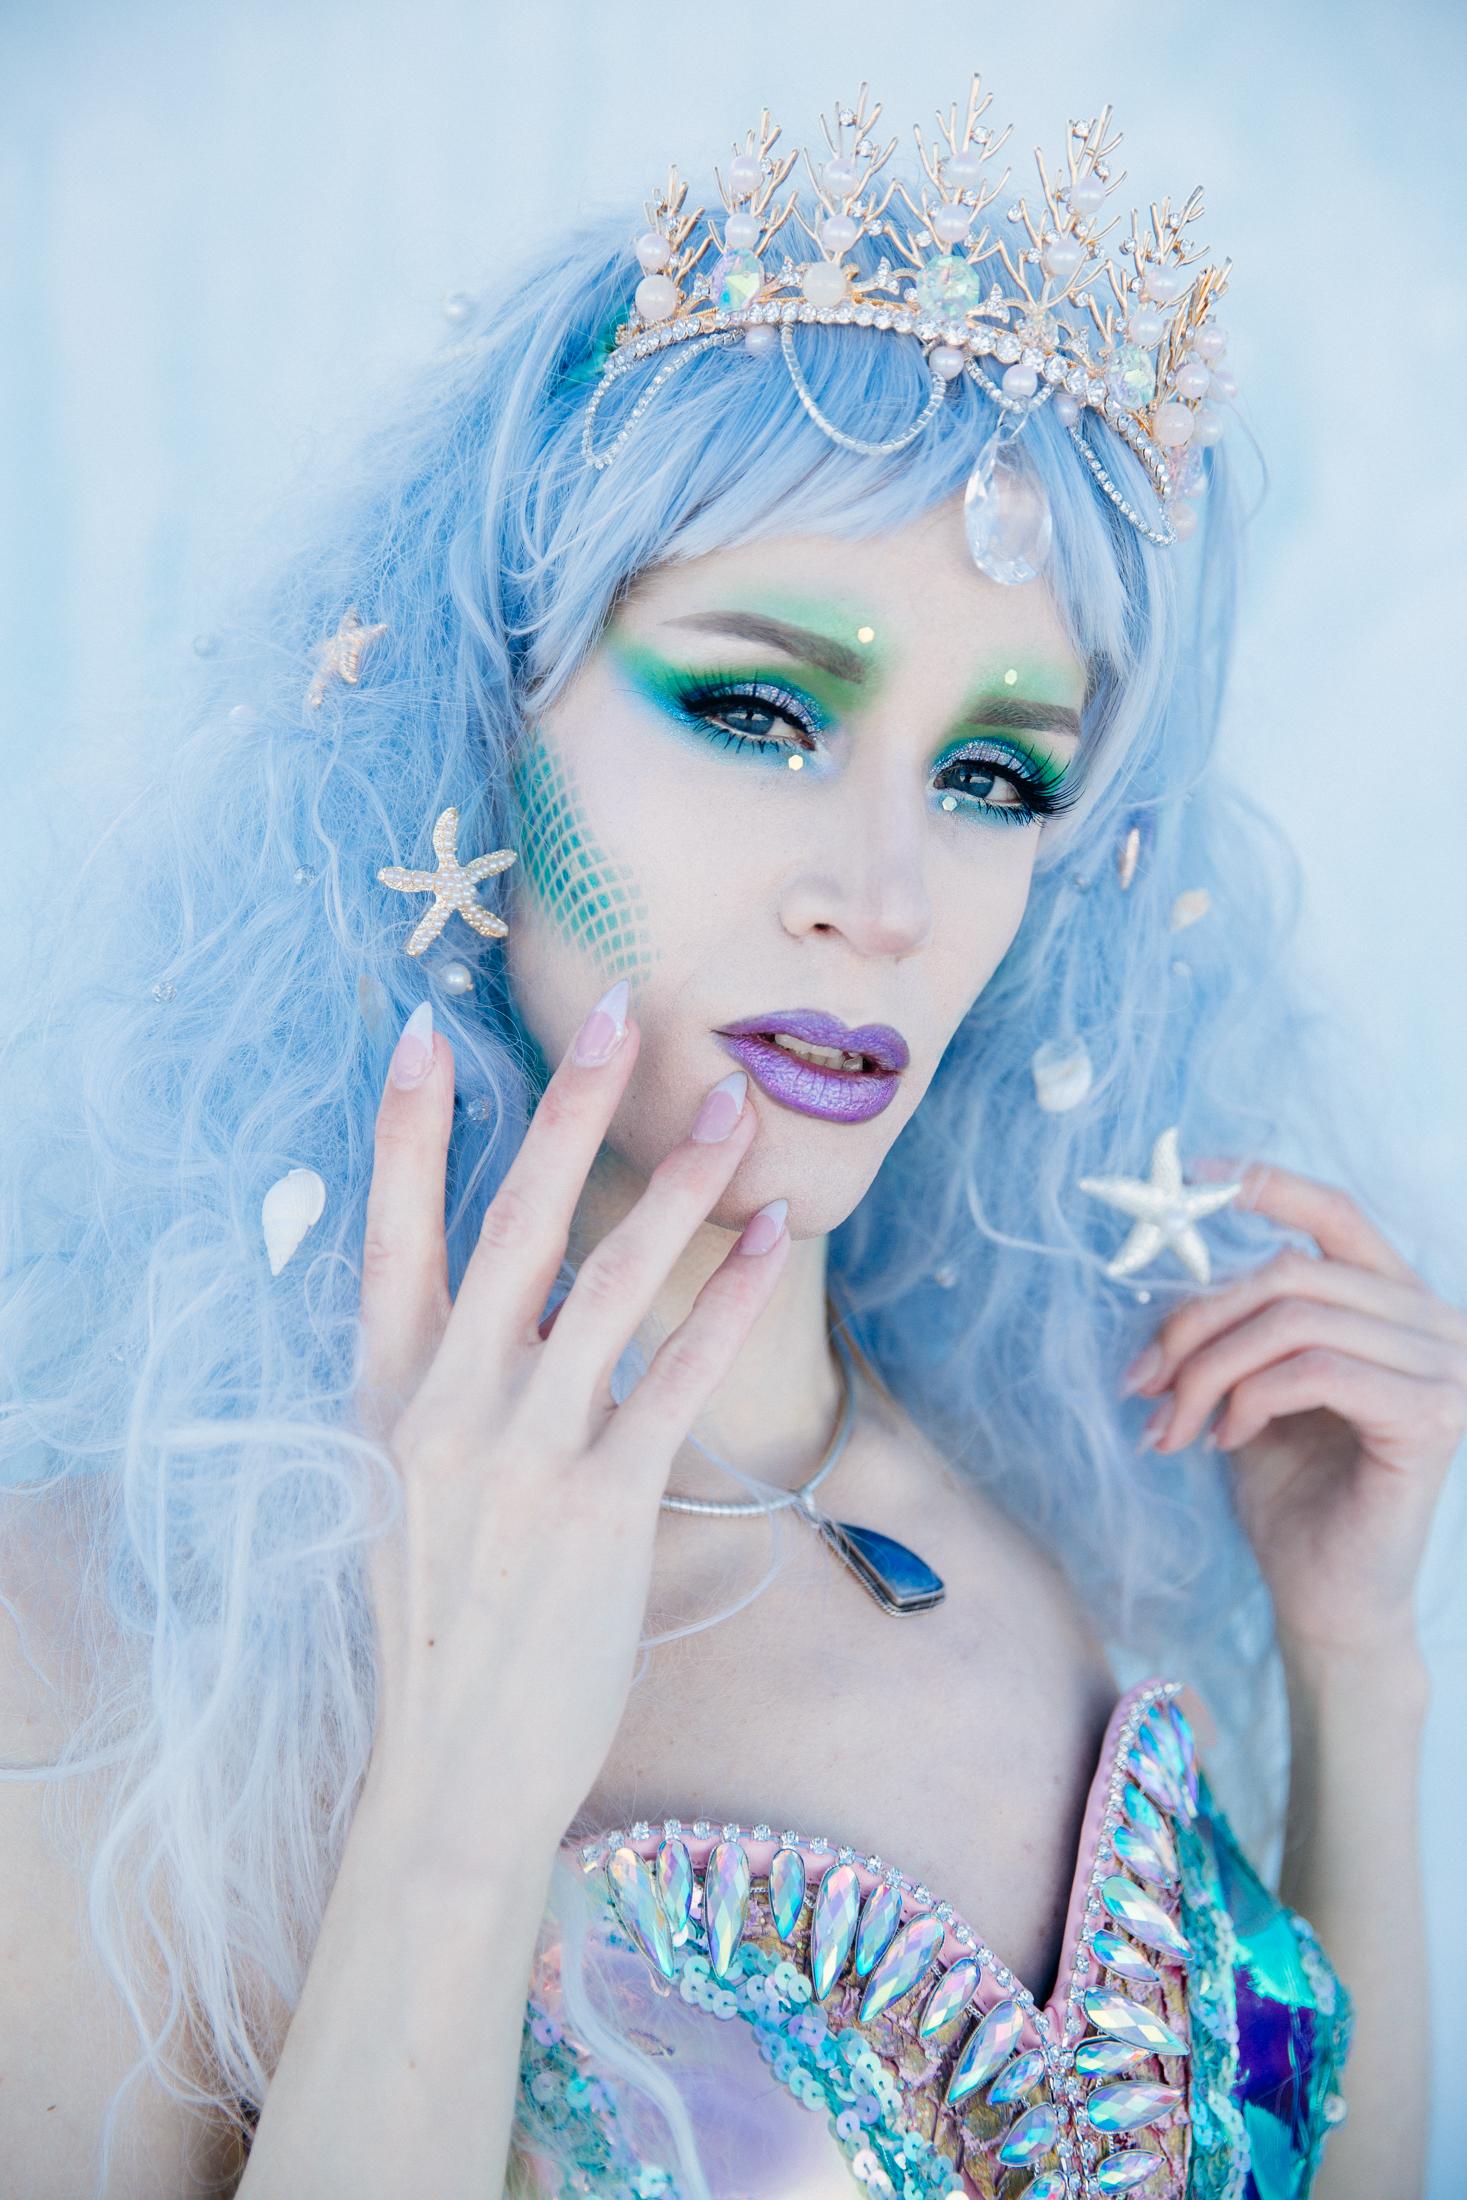 Jen_Montgomery_Photography_KMKDesigns_Portrait_Mermaid_FB-41.jpg